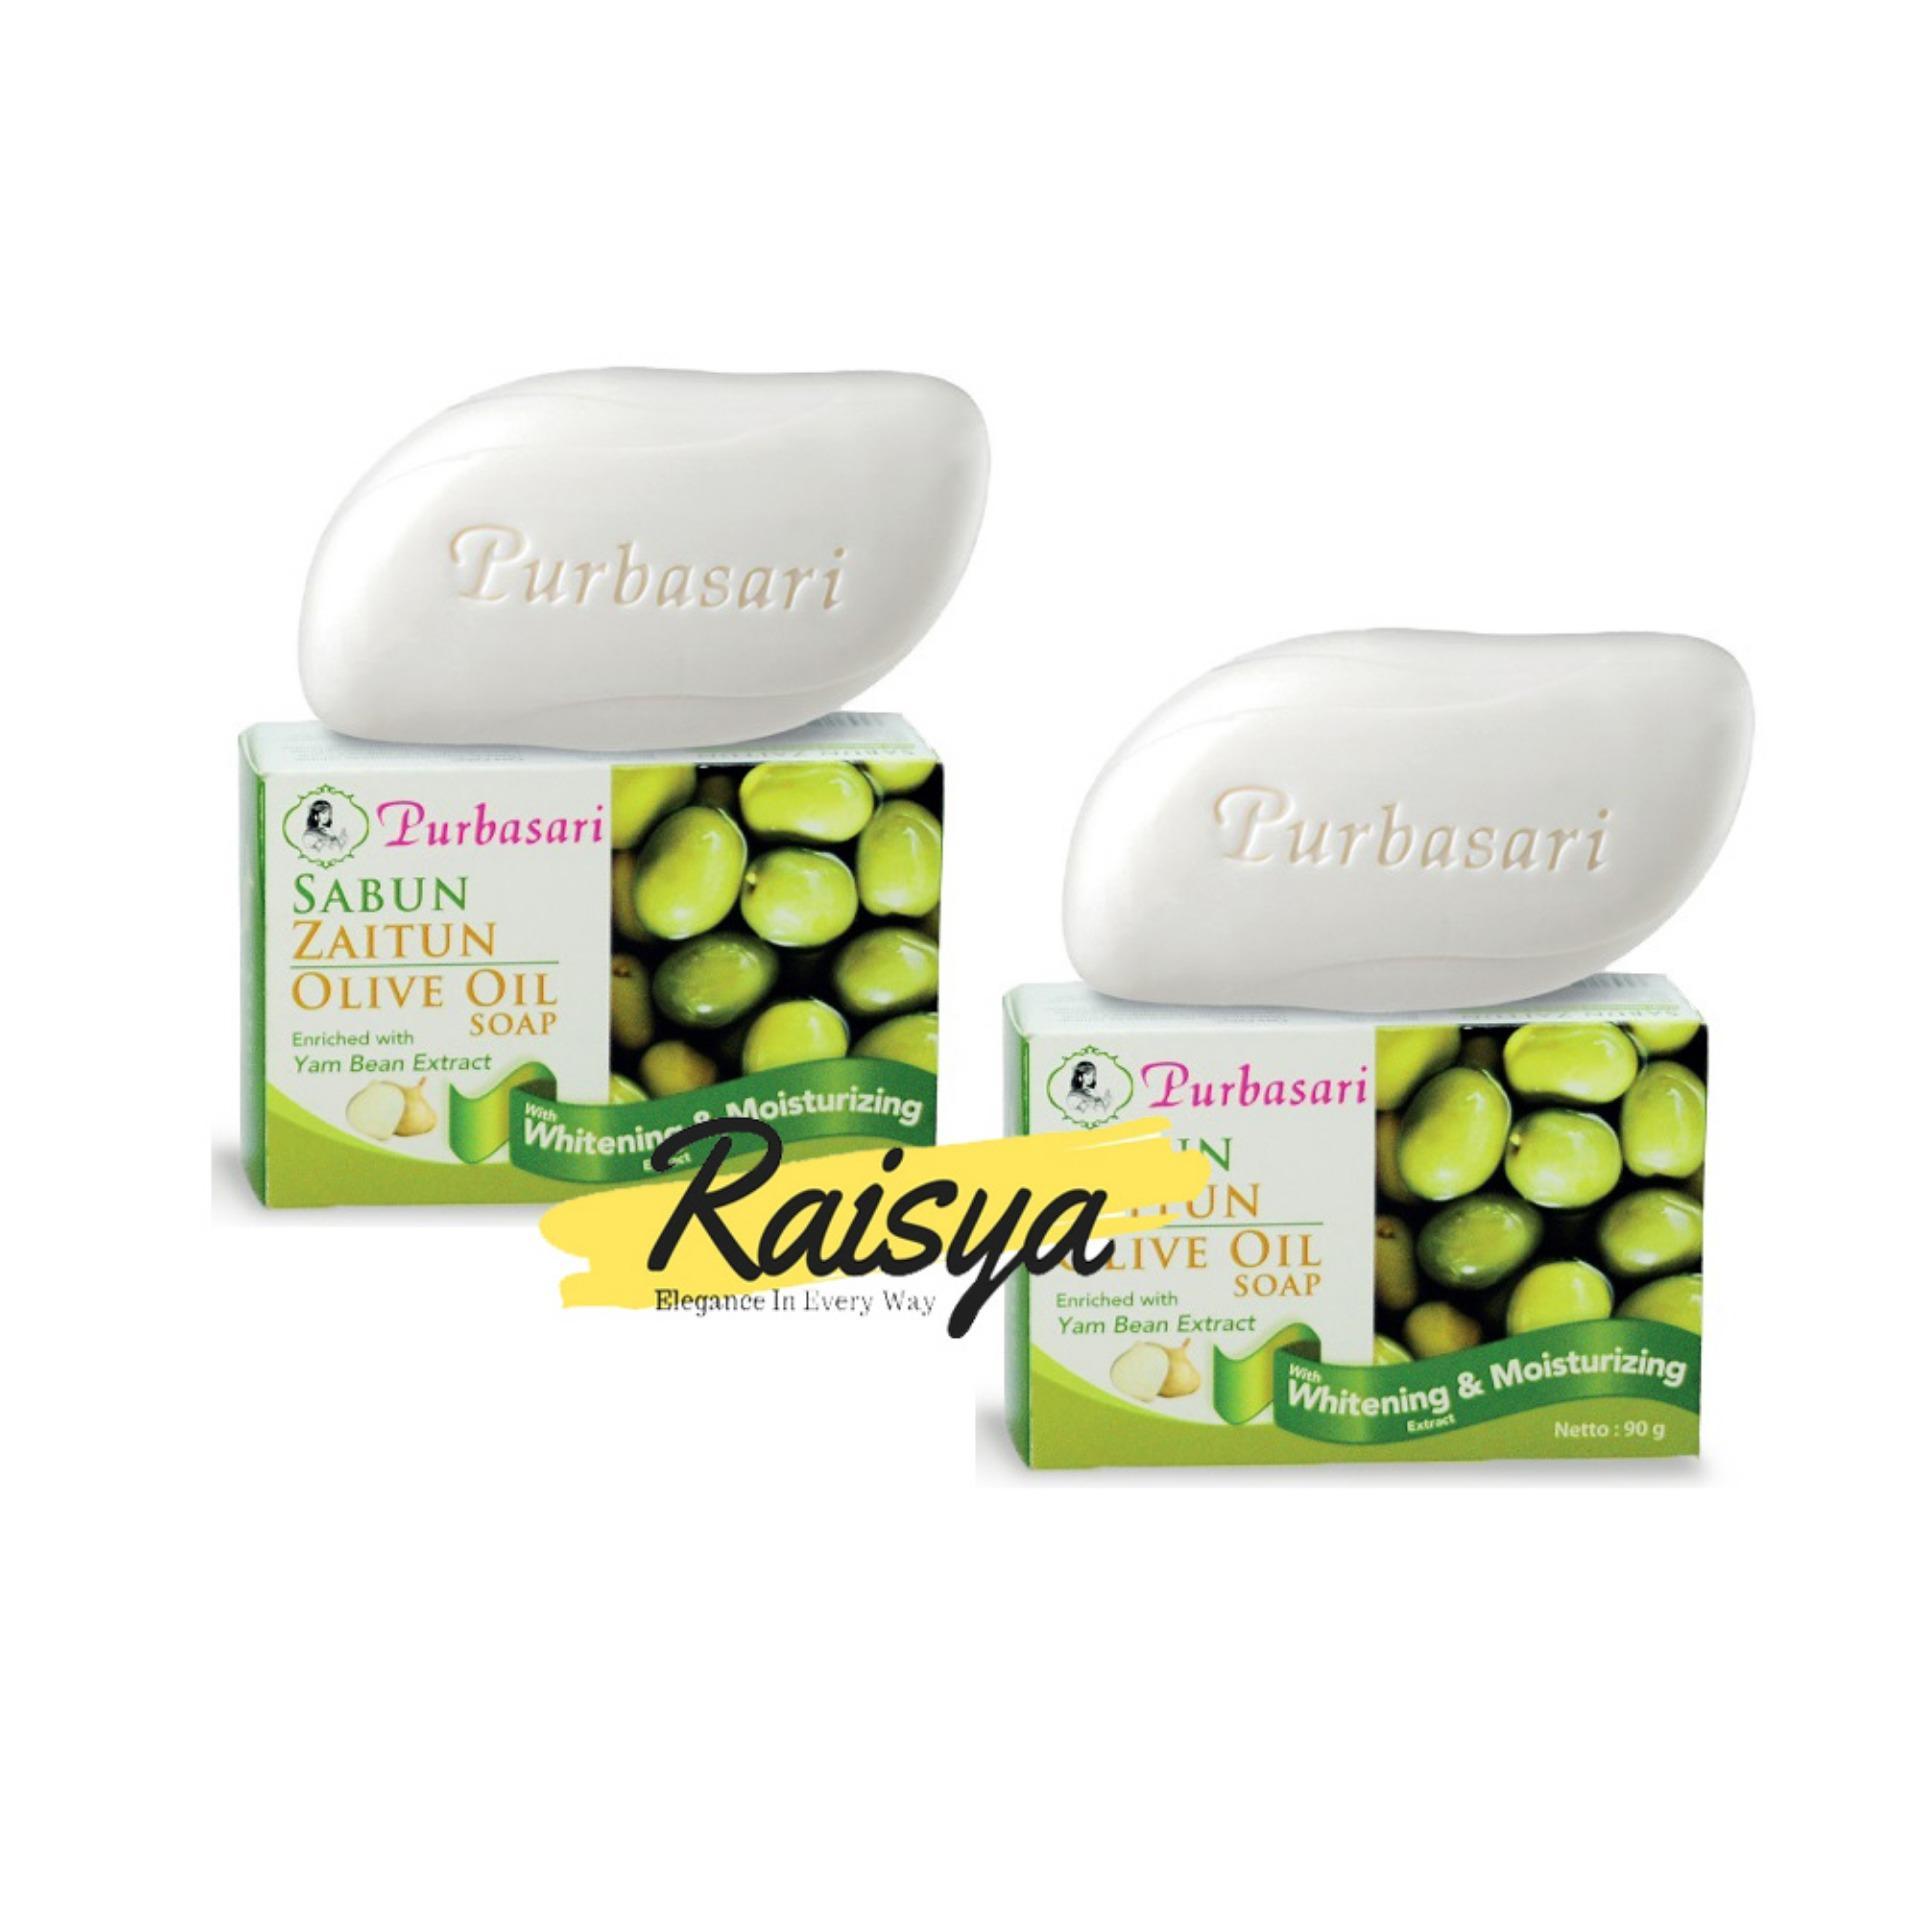 Purbasari Sabun Zaitun Olive Oil With Whitening & Moisturizing 90gr 2pcs